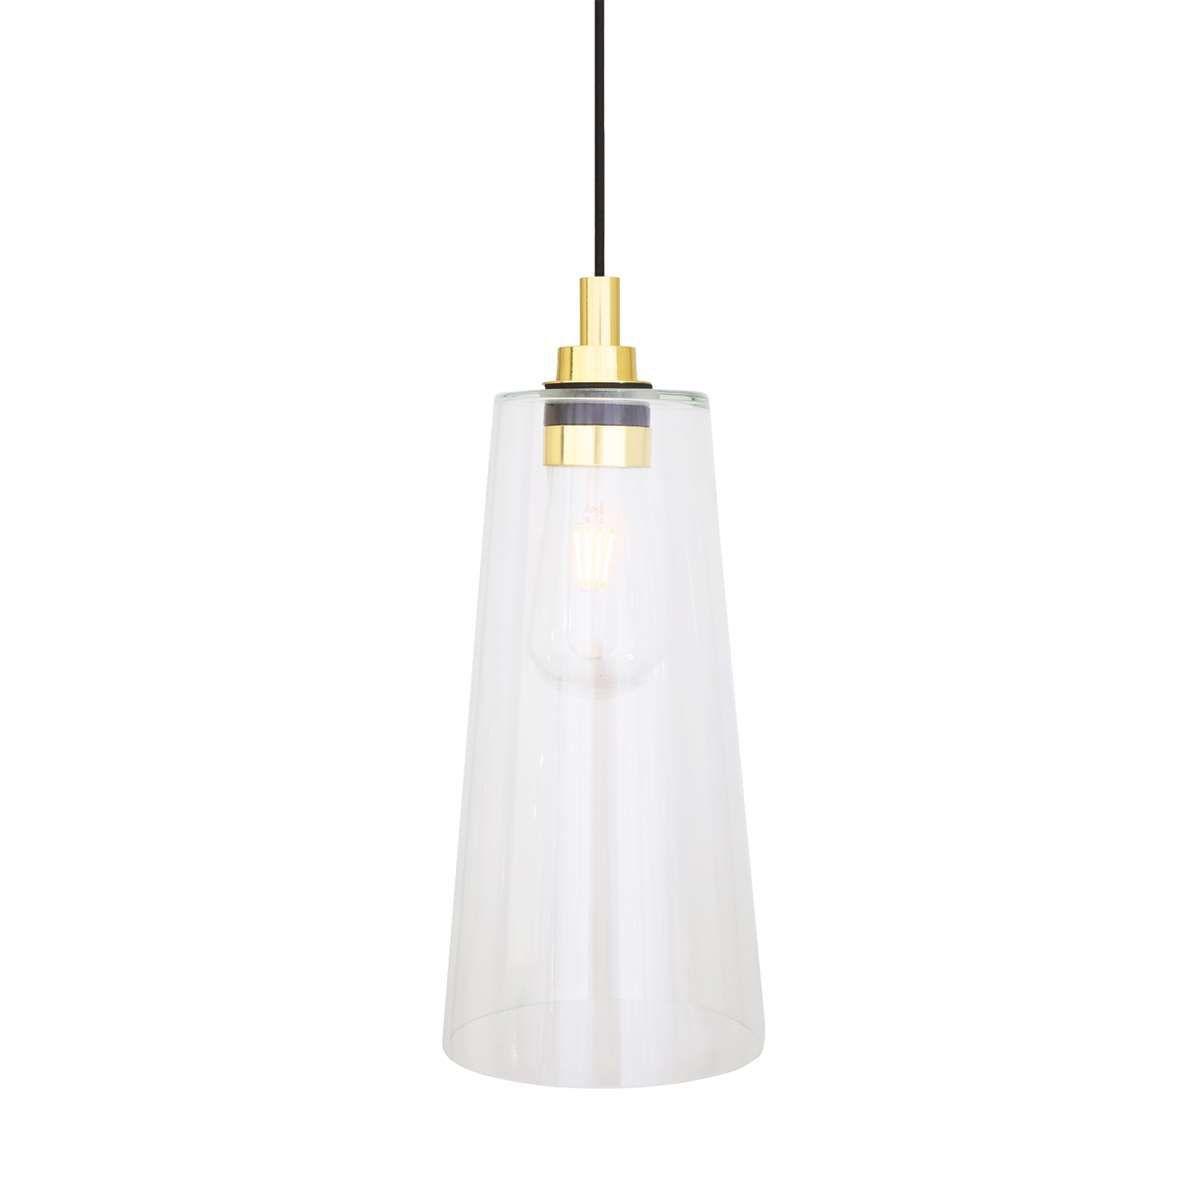 Pendant lamp traditional polished brass glass cari mlbp020 pendant lamp traditional polished brass glass cari mlbp020 aloadofball Image collections